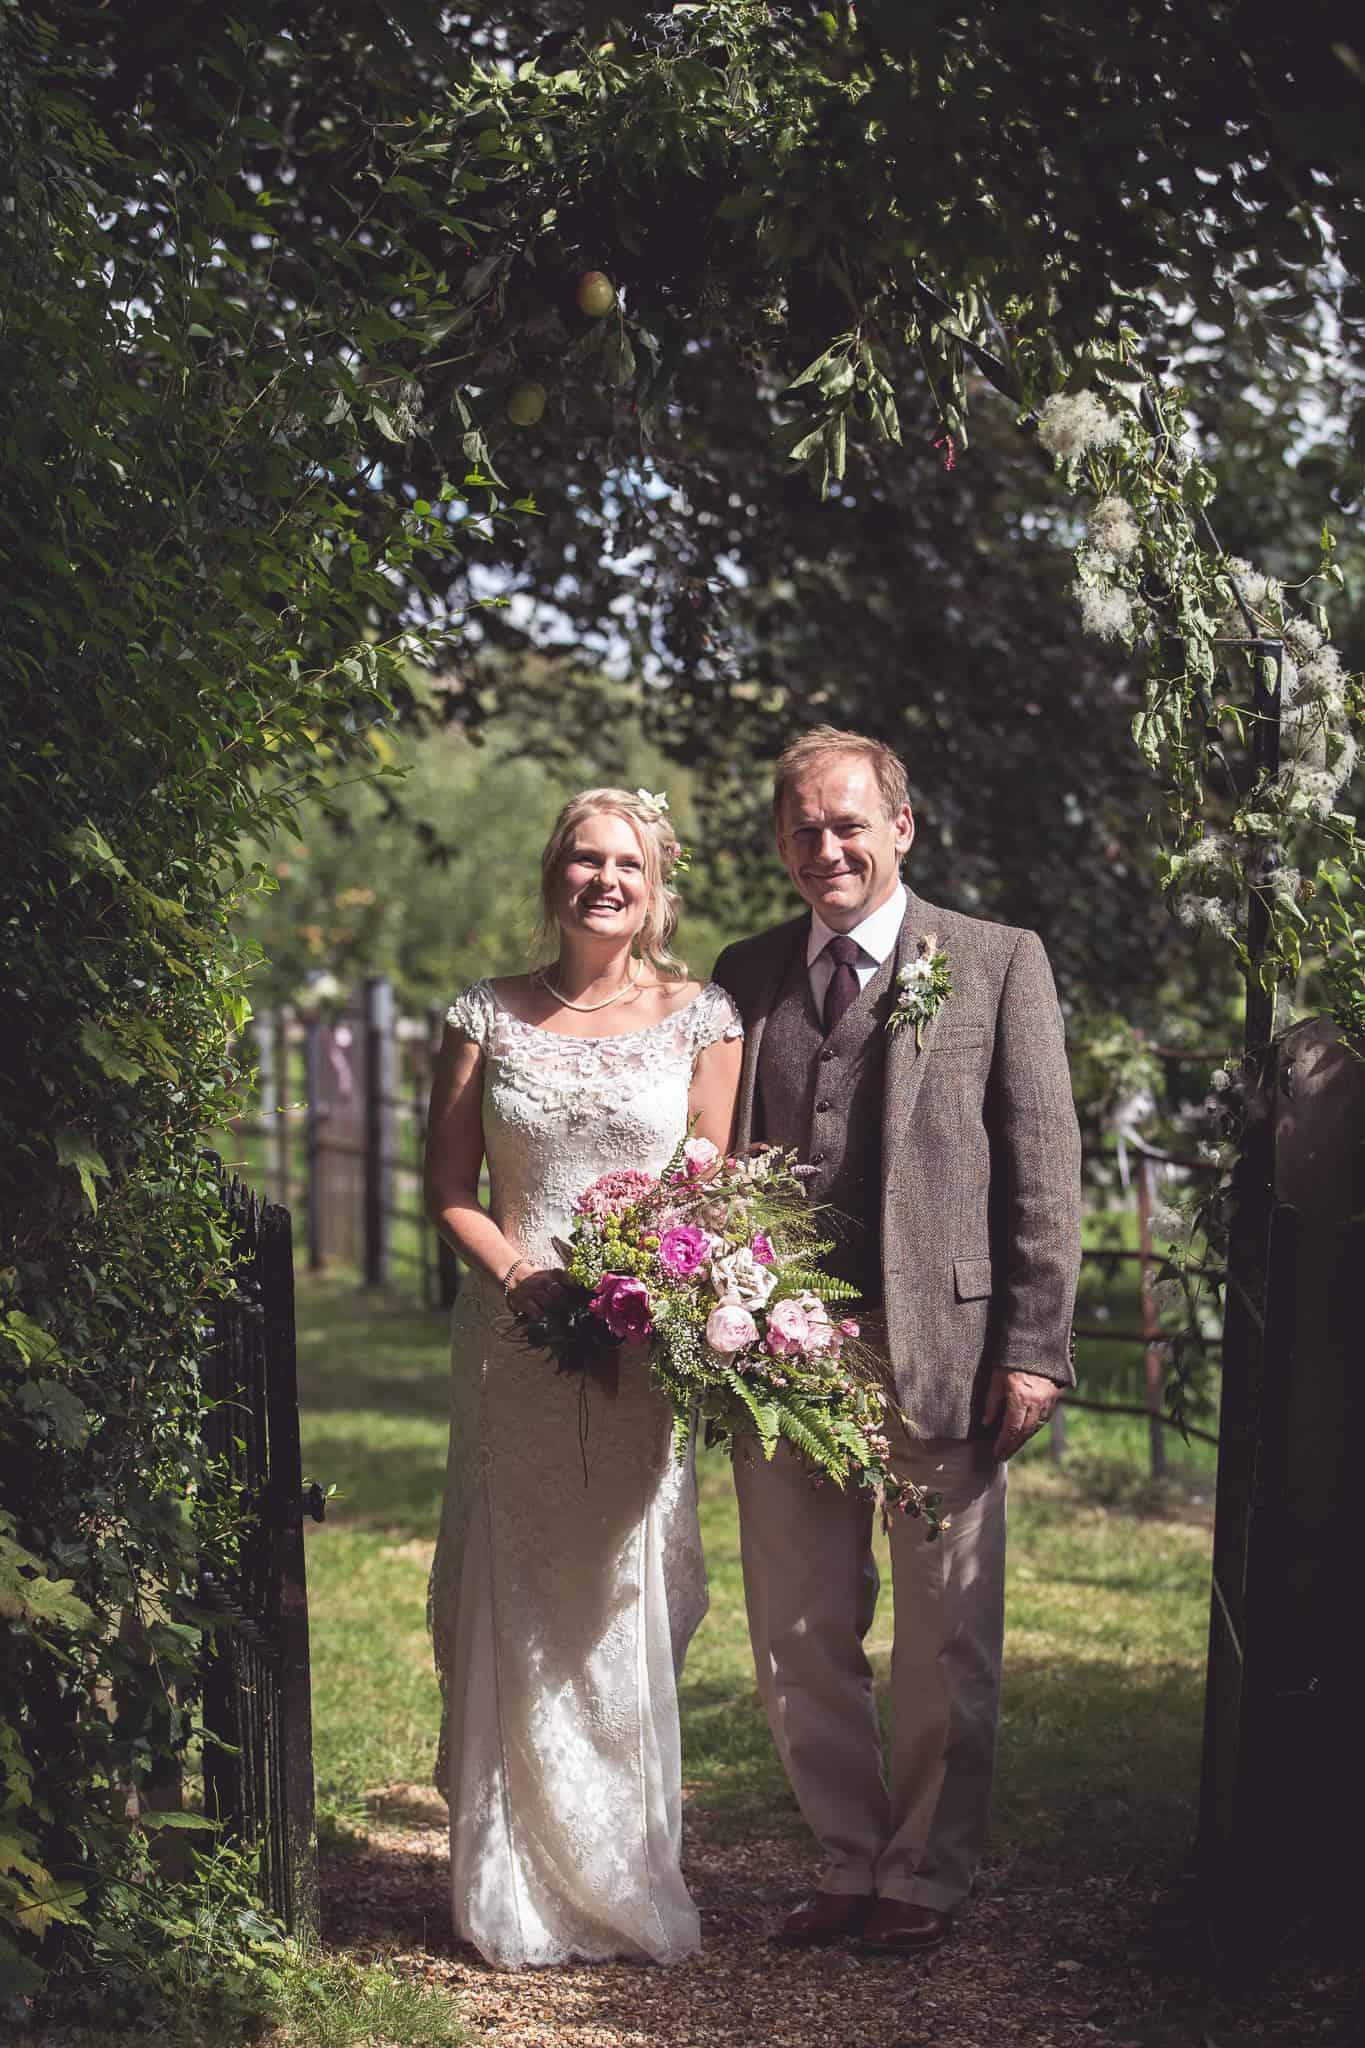 wedding photography non legal celebrant outdoors ceremonies ceremony outdoor bride